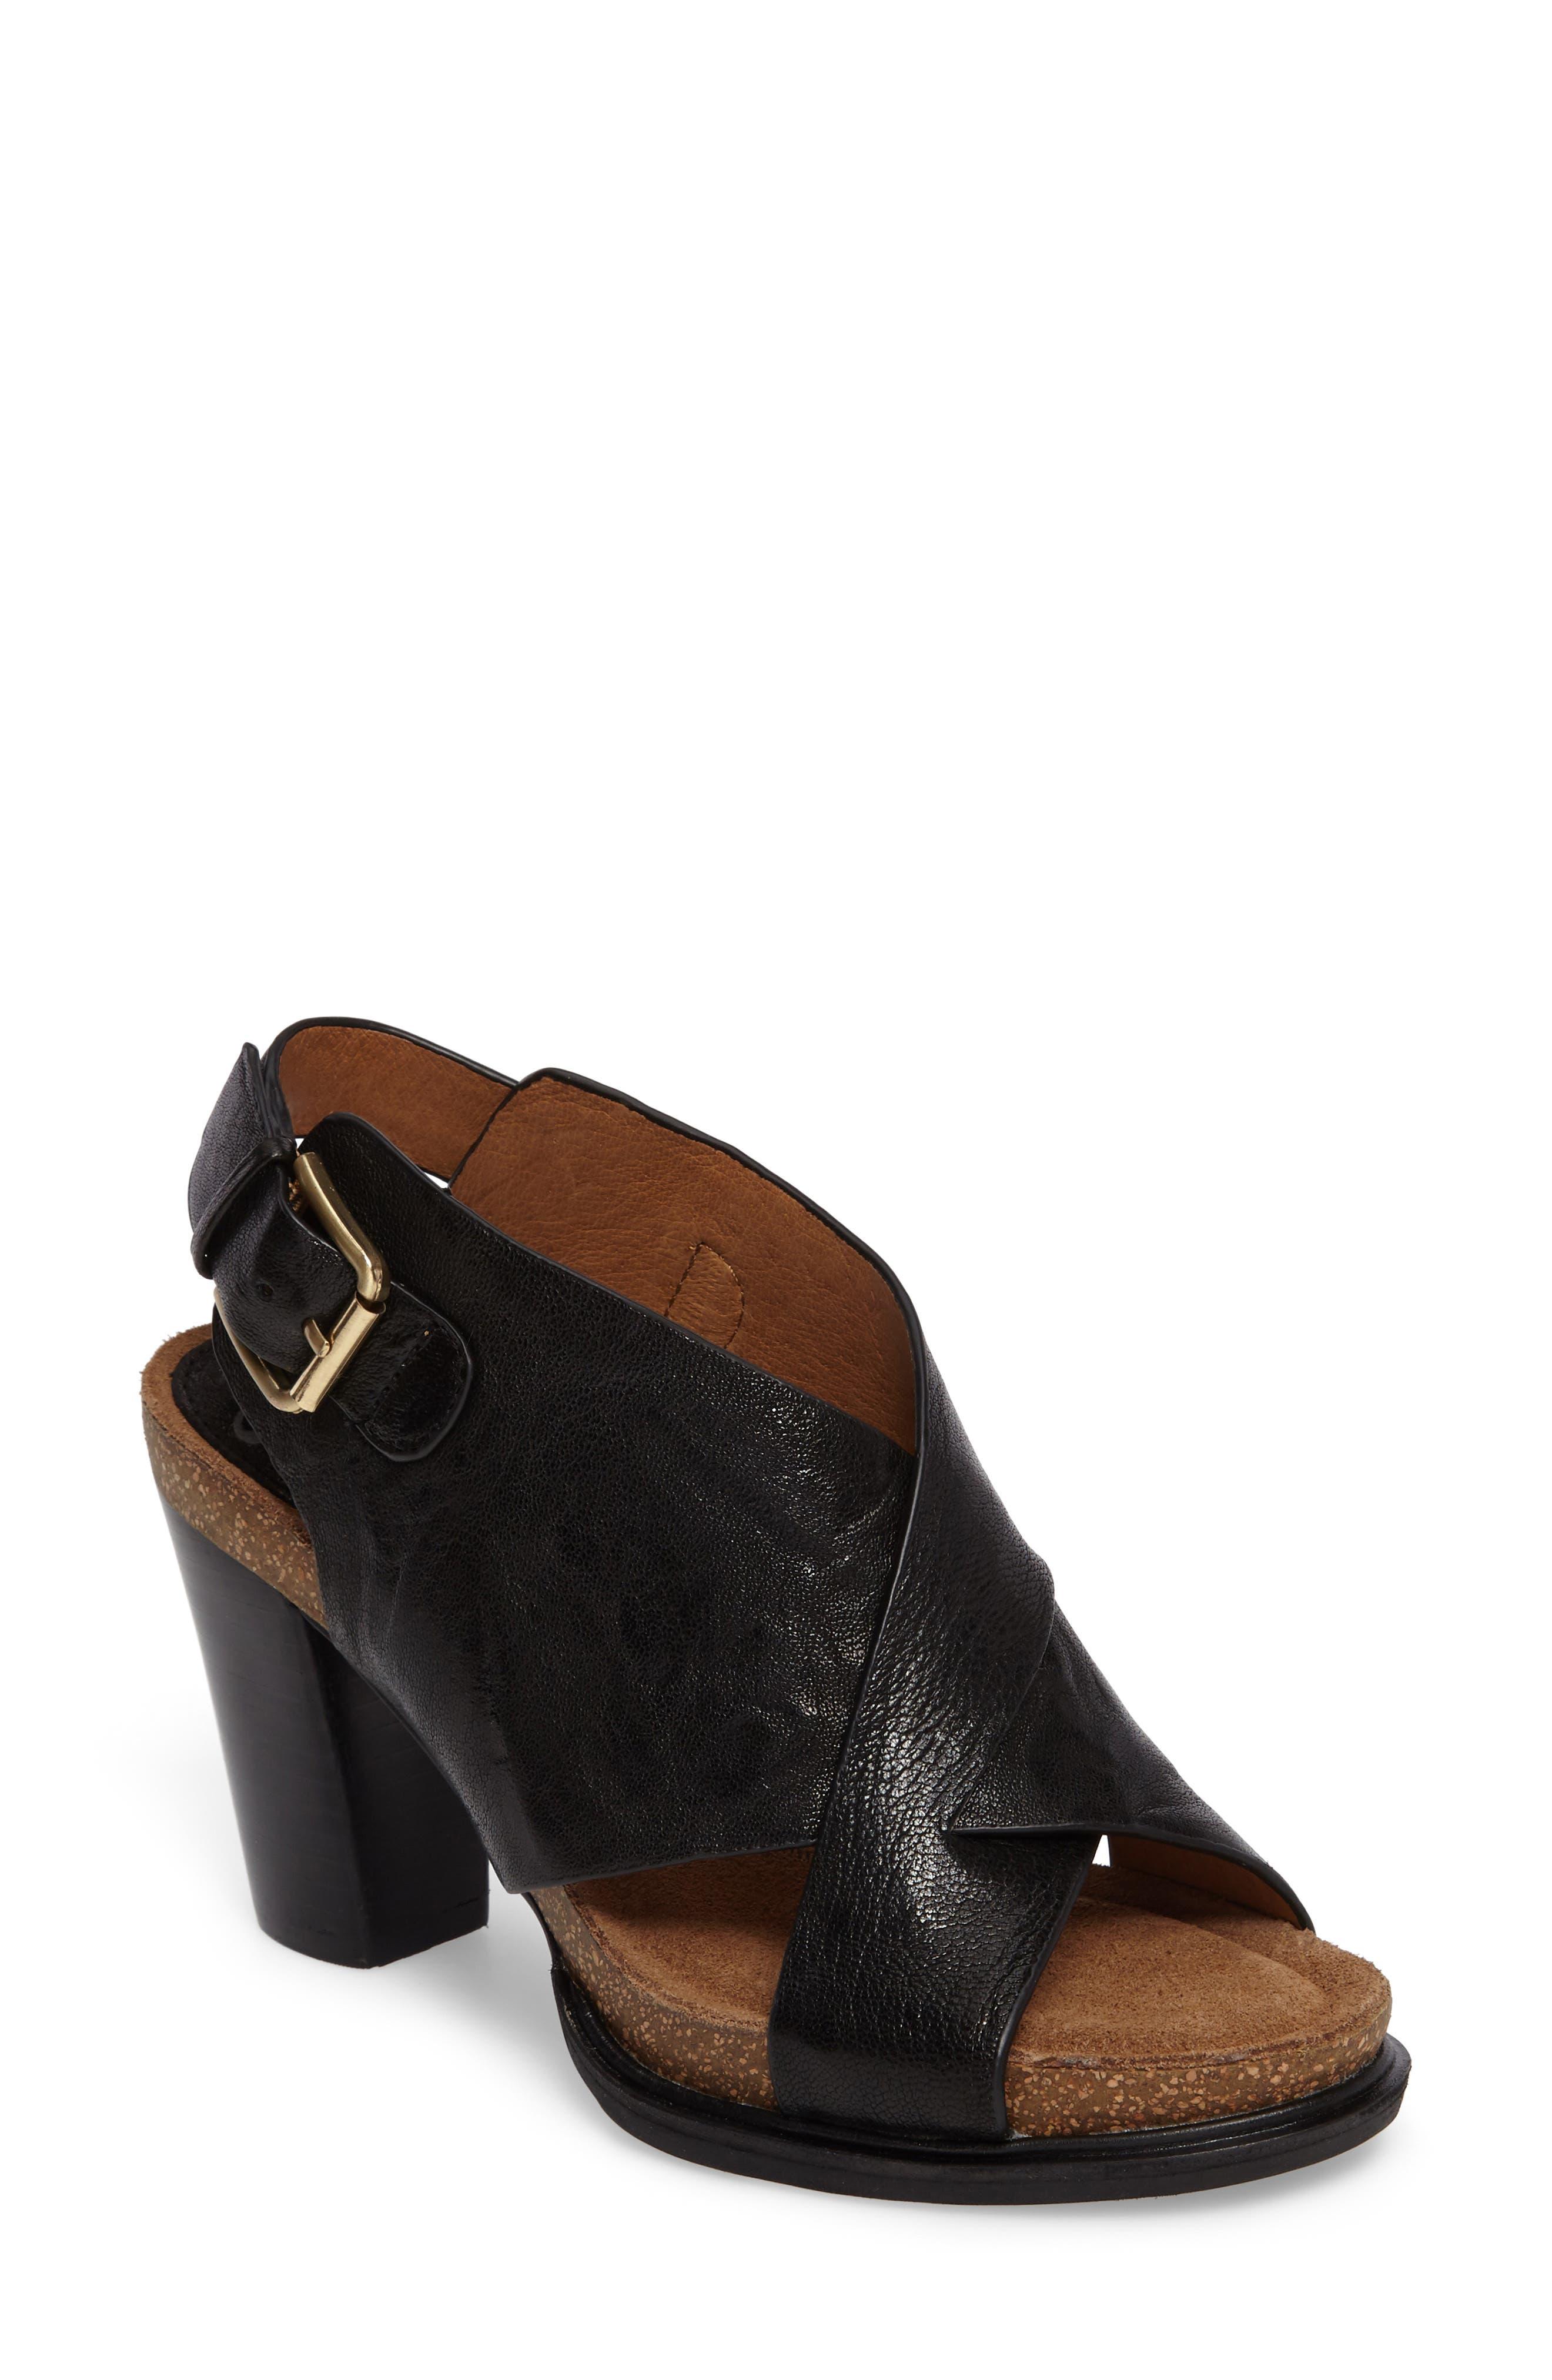 Main Image - Söfft Cambria Platform Sandal (Women)